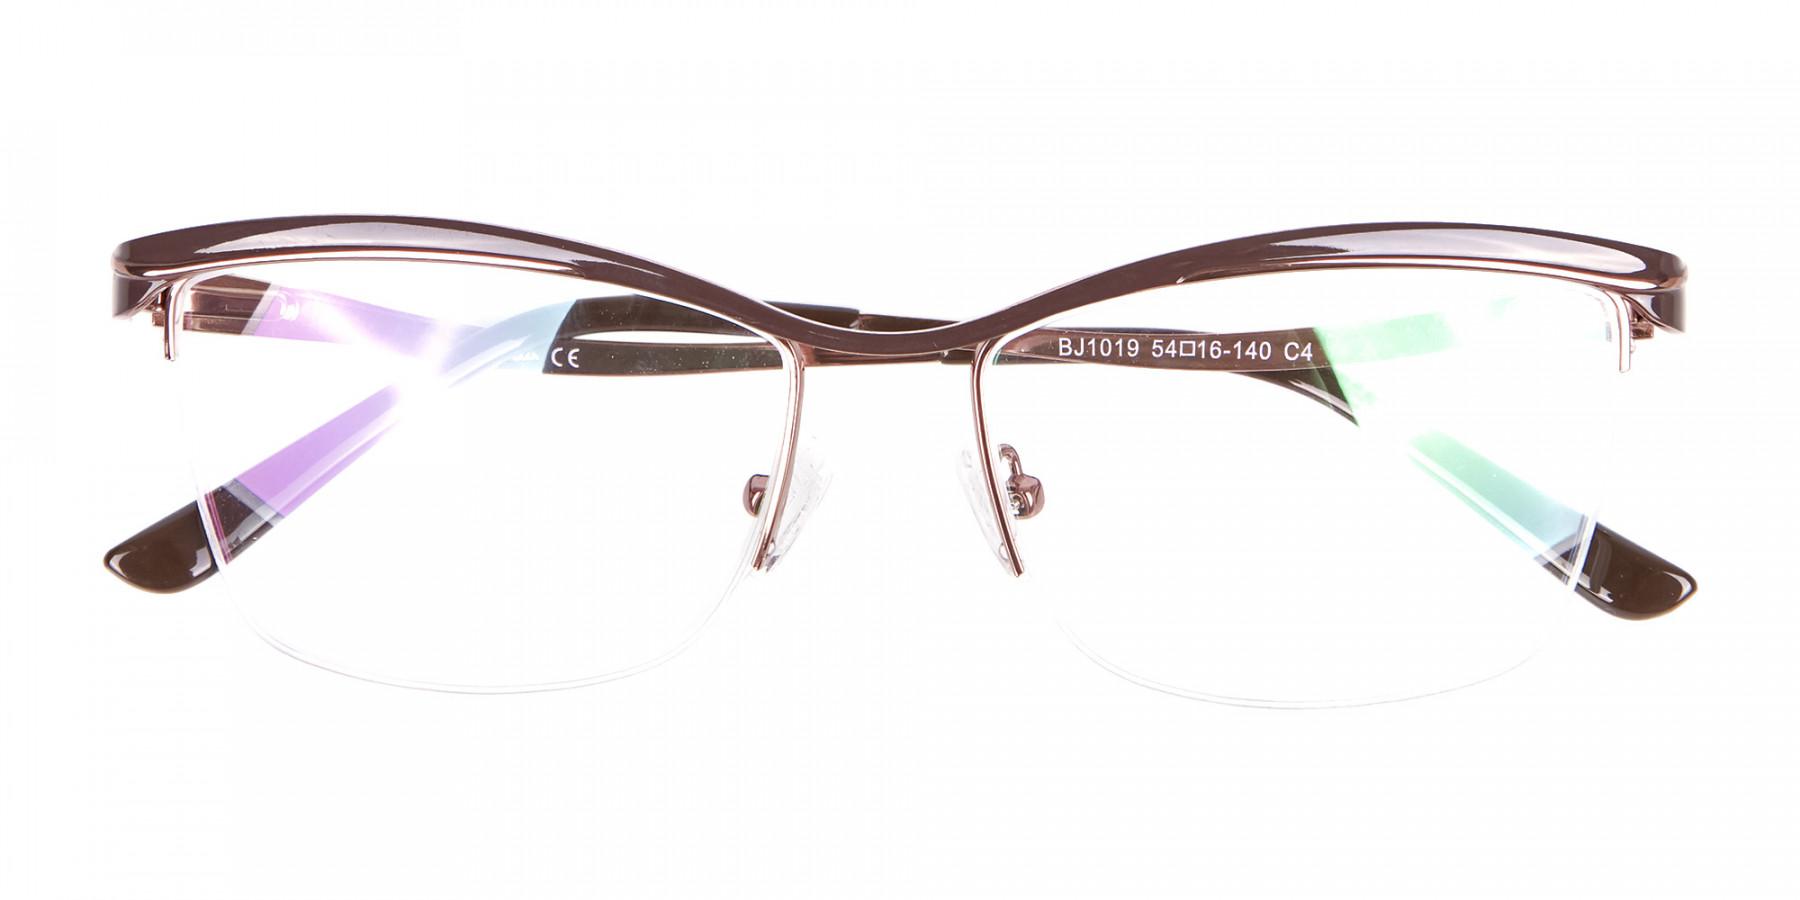 Glossy Brown Browline Half-Rimmed Glasses-1